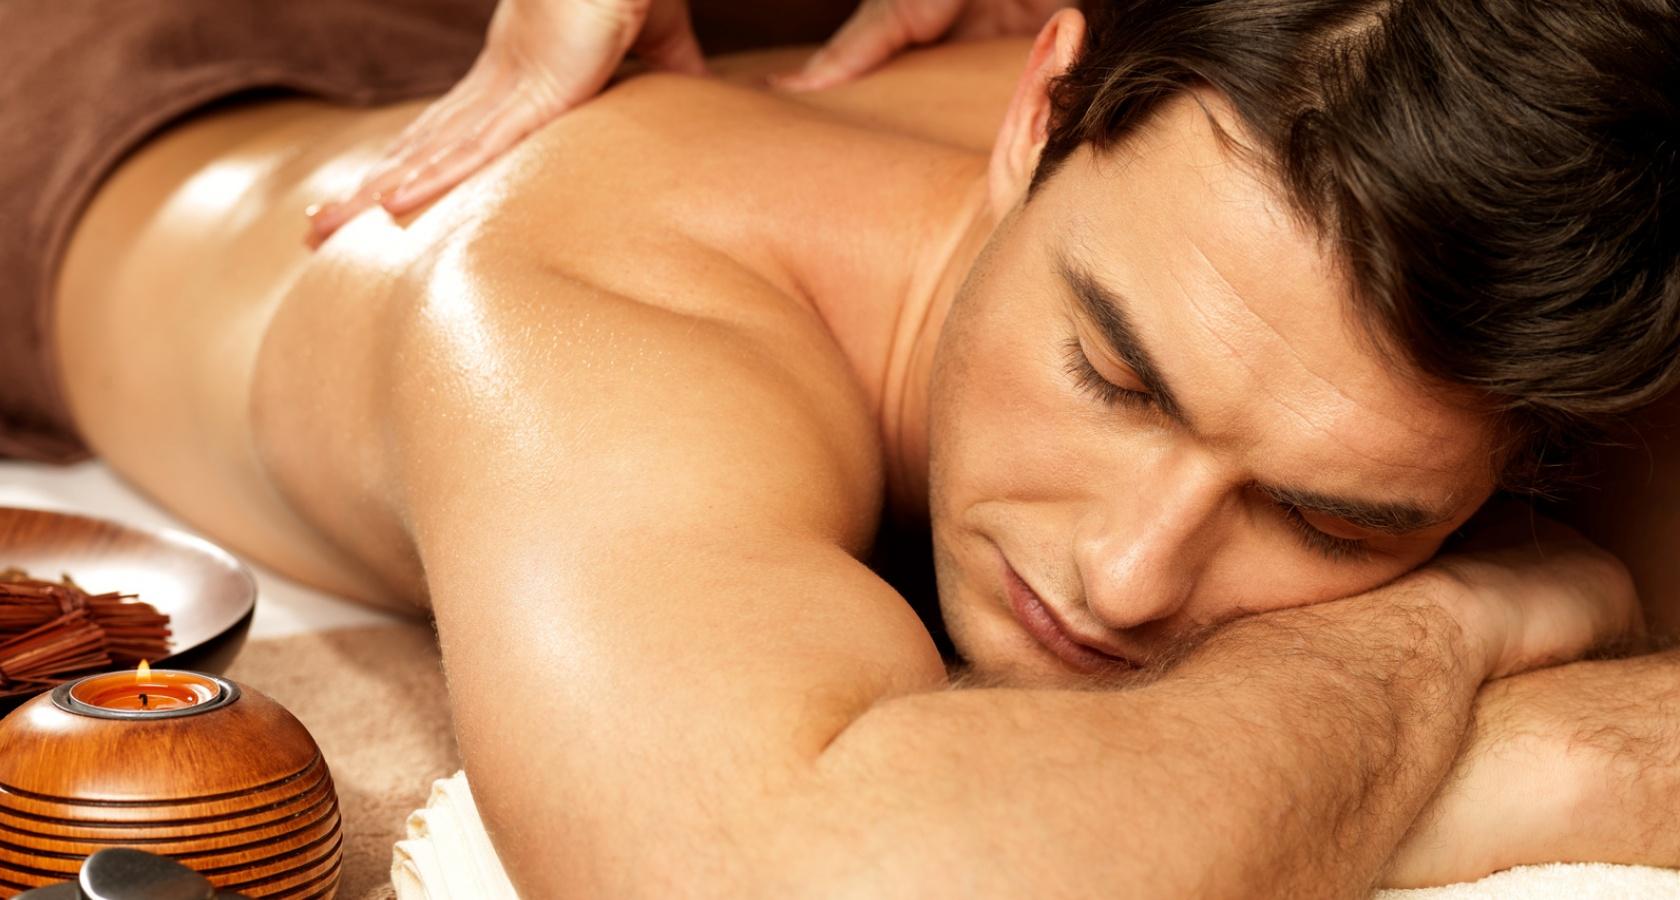 fotolia mezczyzna w spa - Ritual Spa For Men